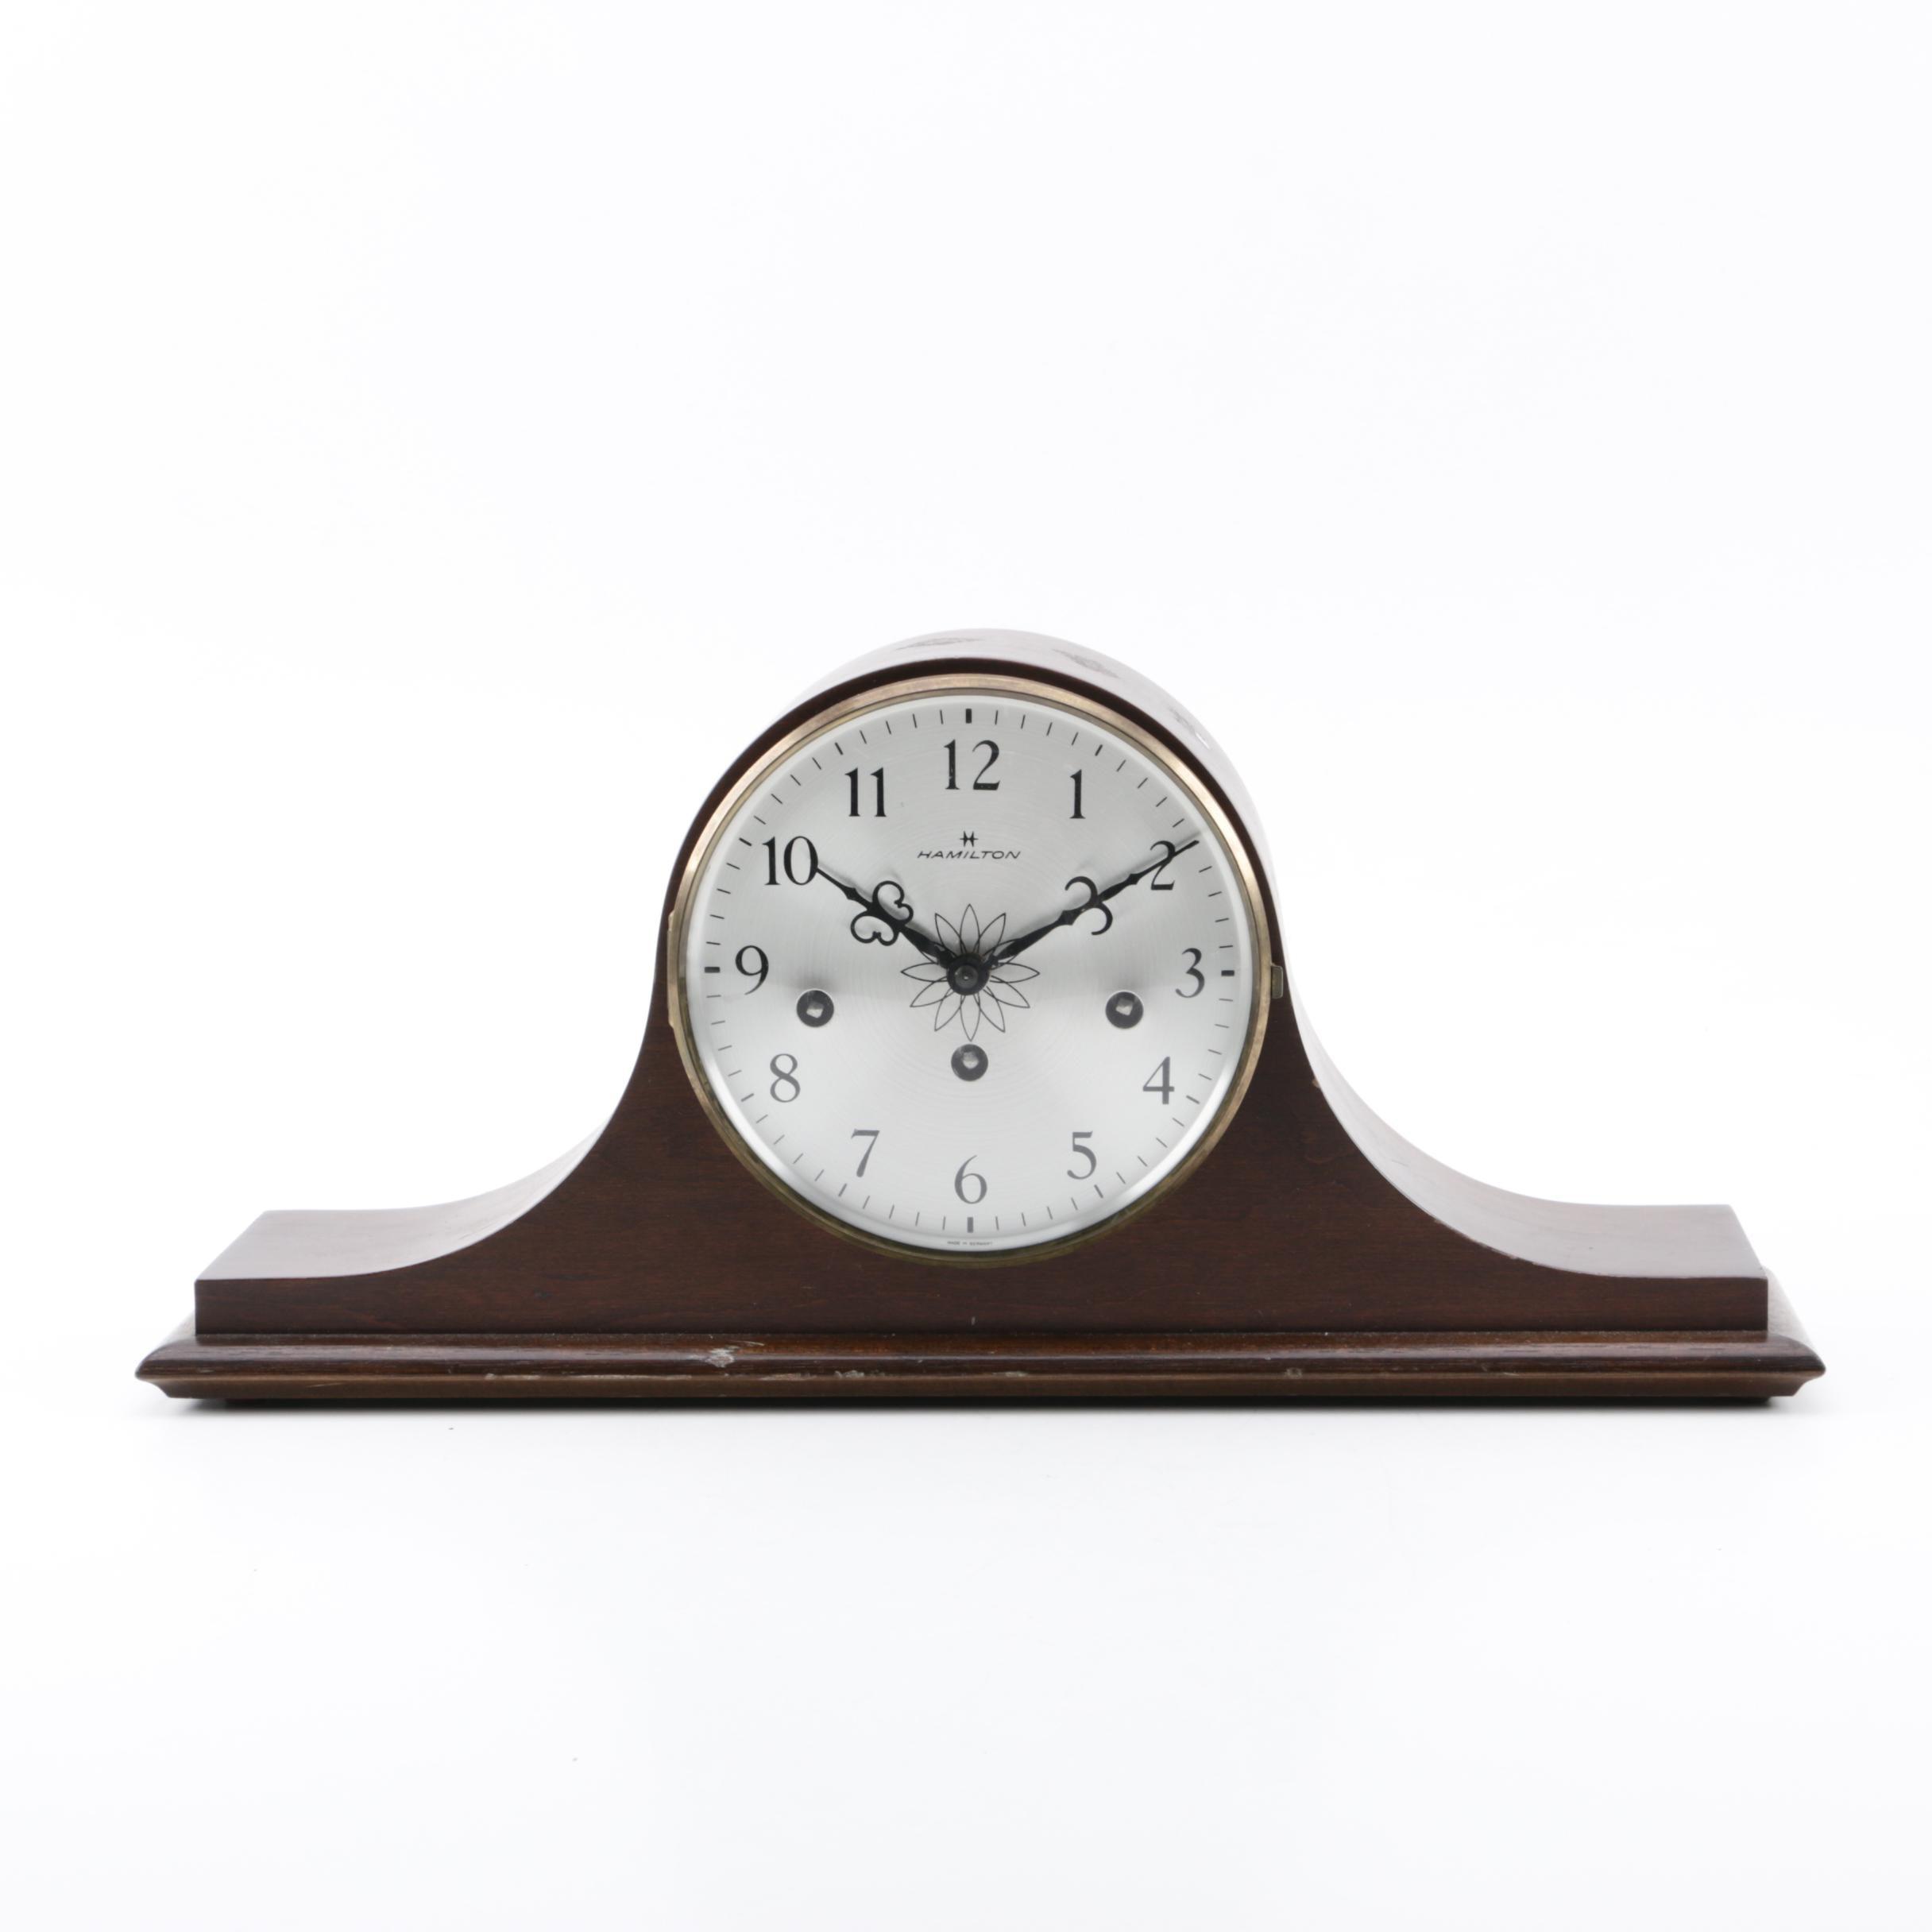 Hamilton Tambour Mantel Clock with Hermle Movement